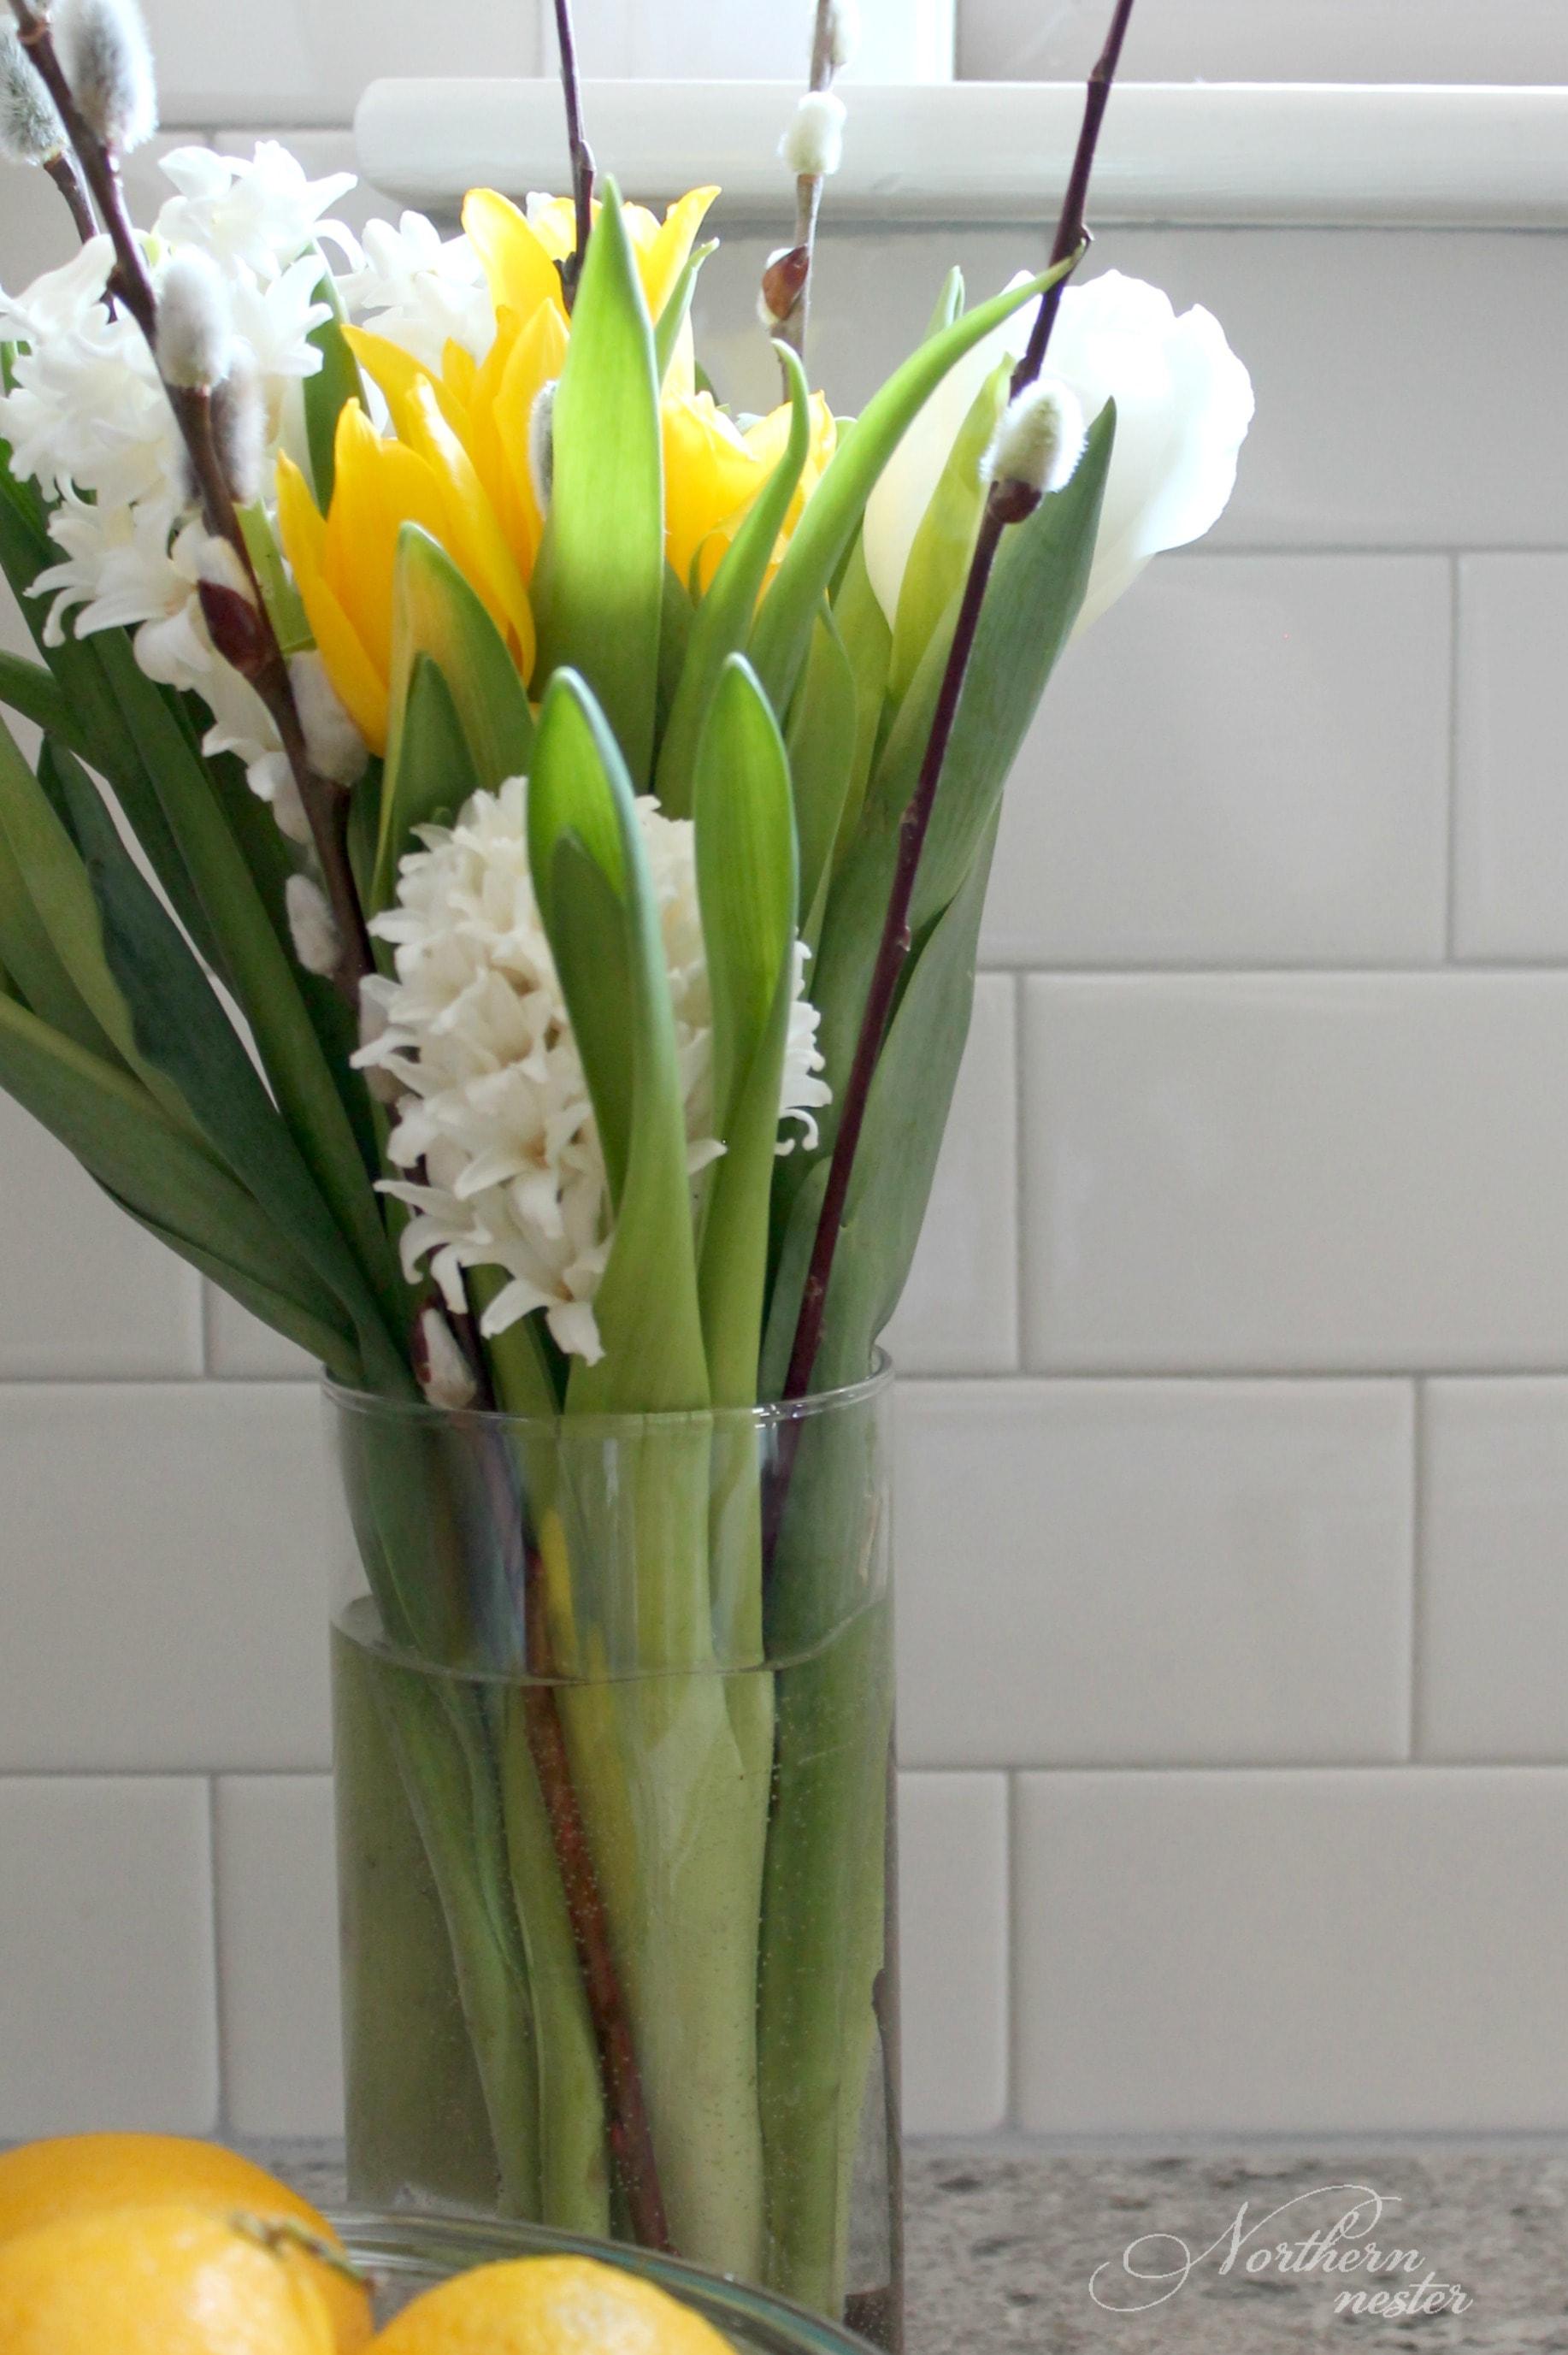 Flower vase kijiji - The Dollar Store Also Sells Vases